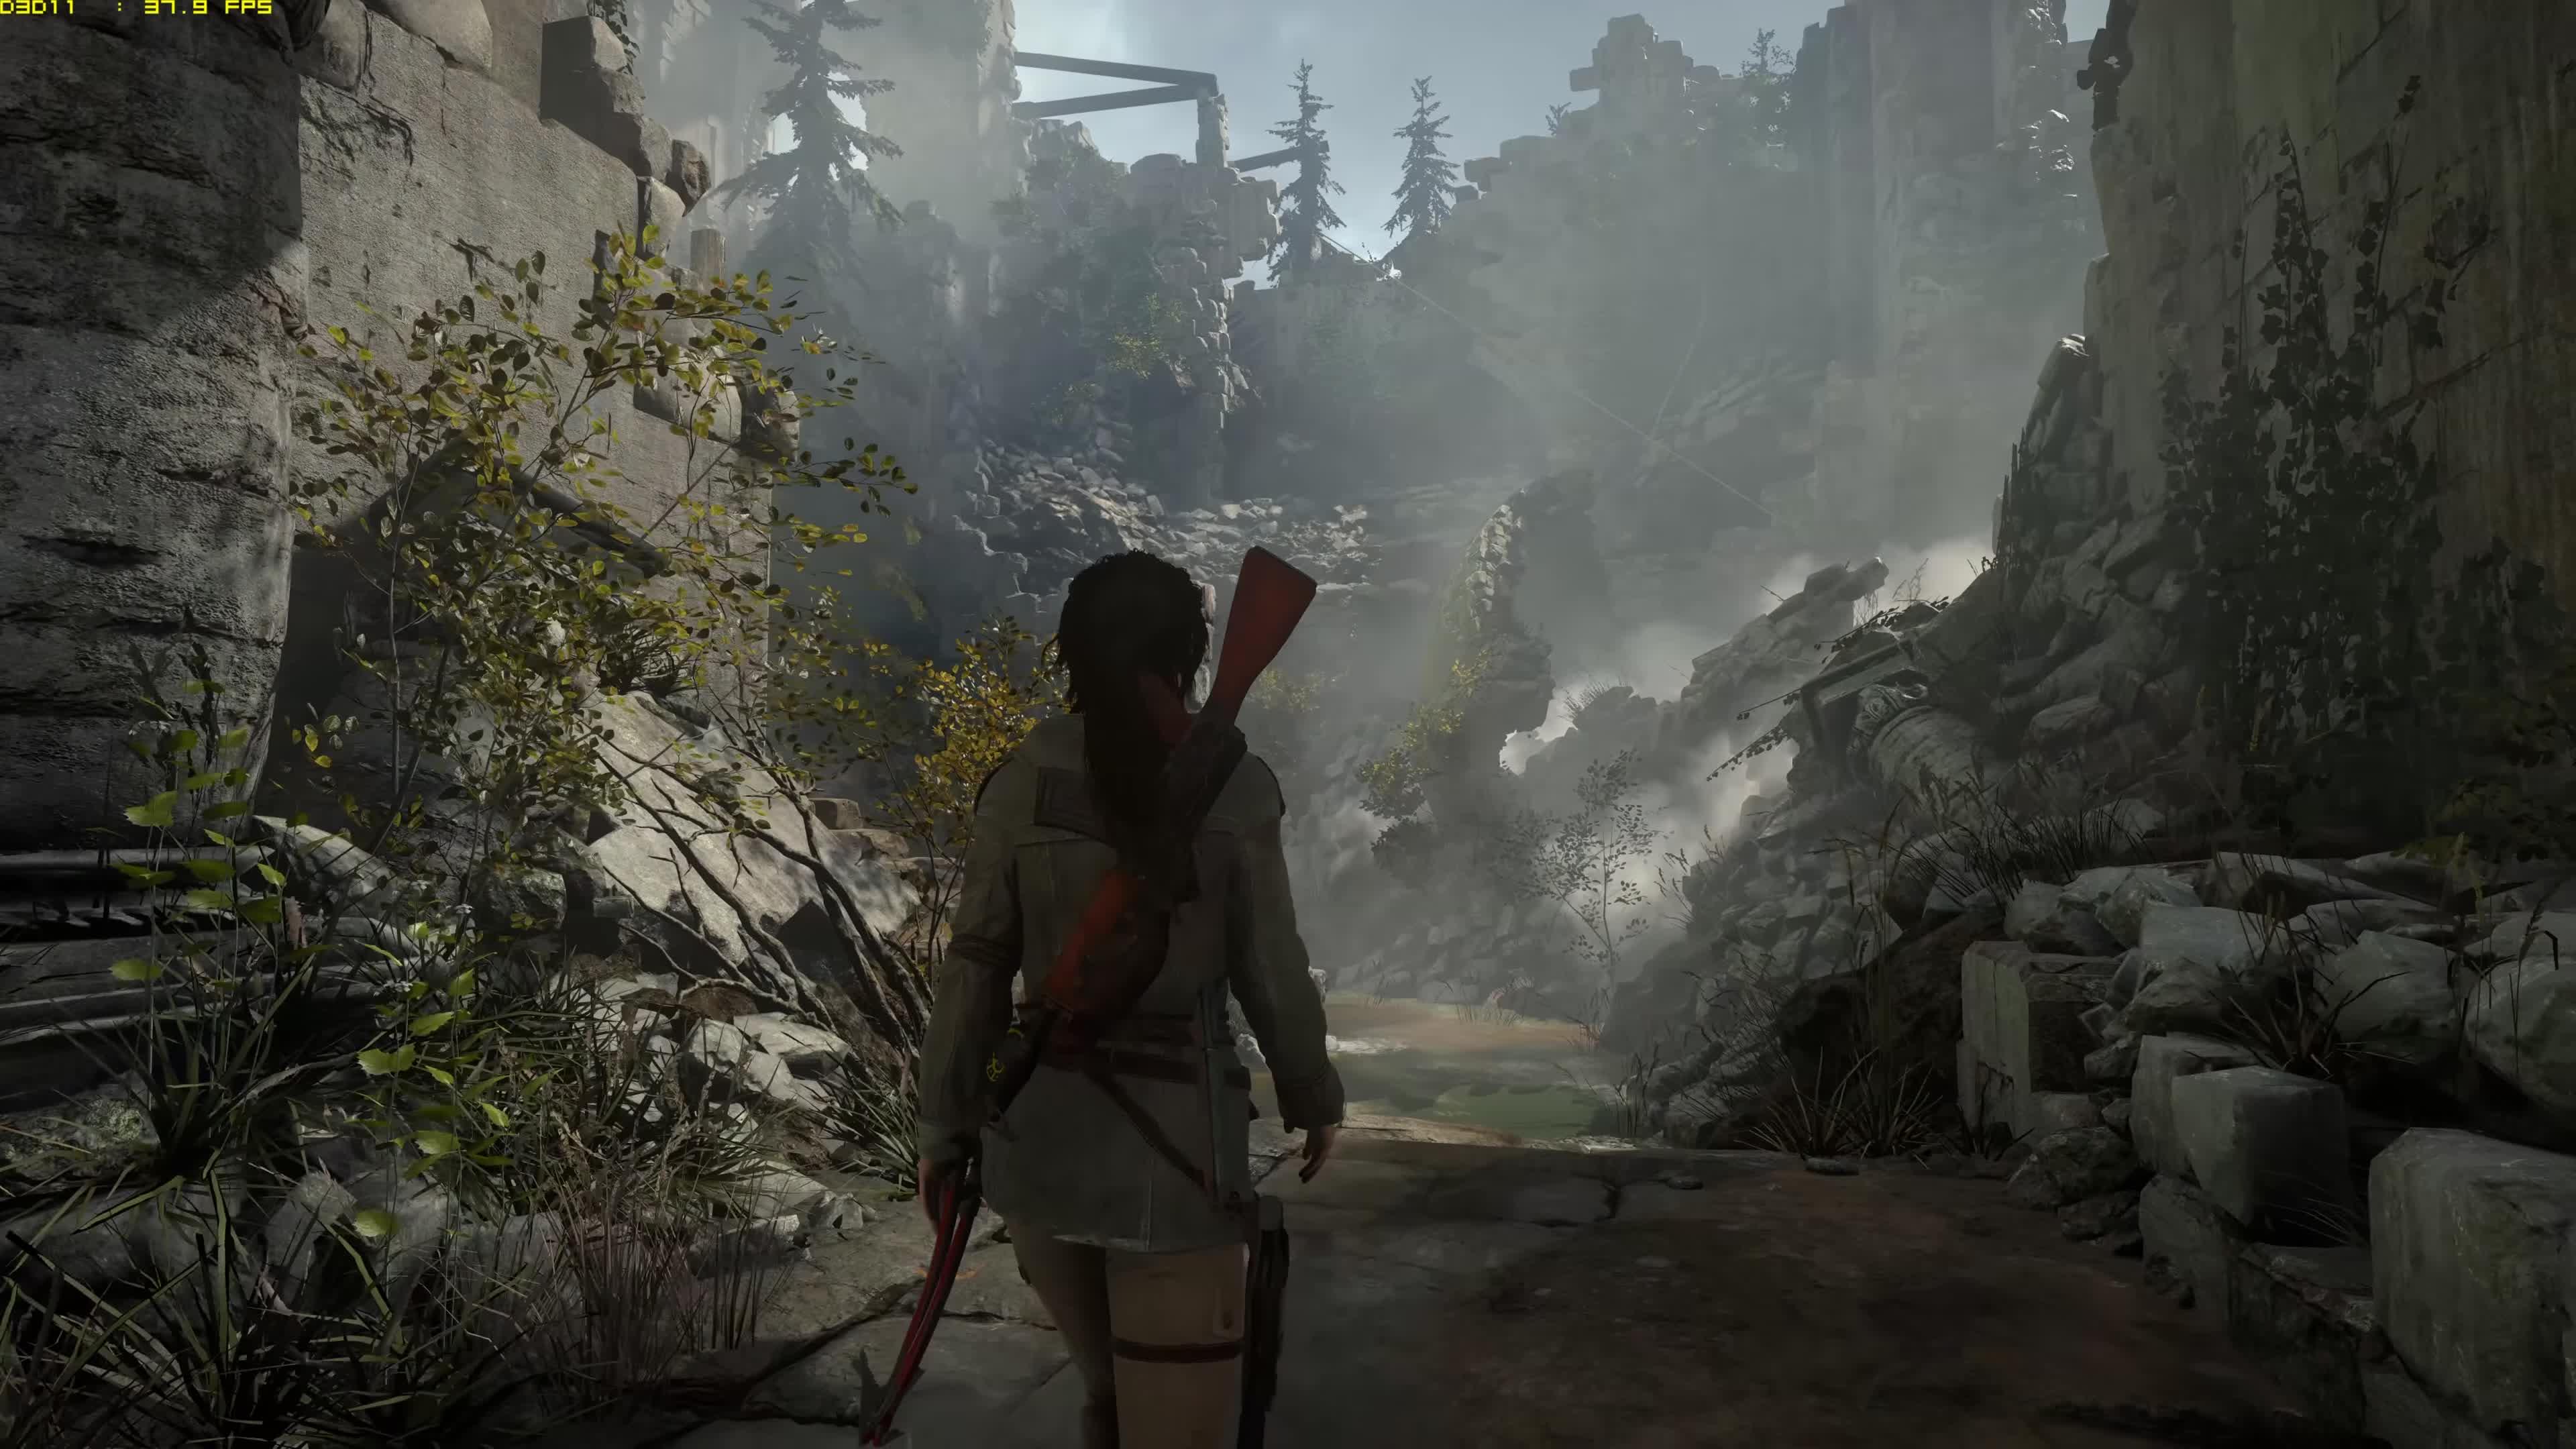 Rise Of The Tomb Raider 8k 4320p60 Gameplay Titan X Pascal 4 Way